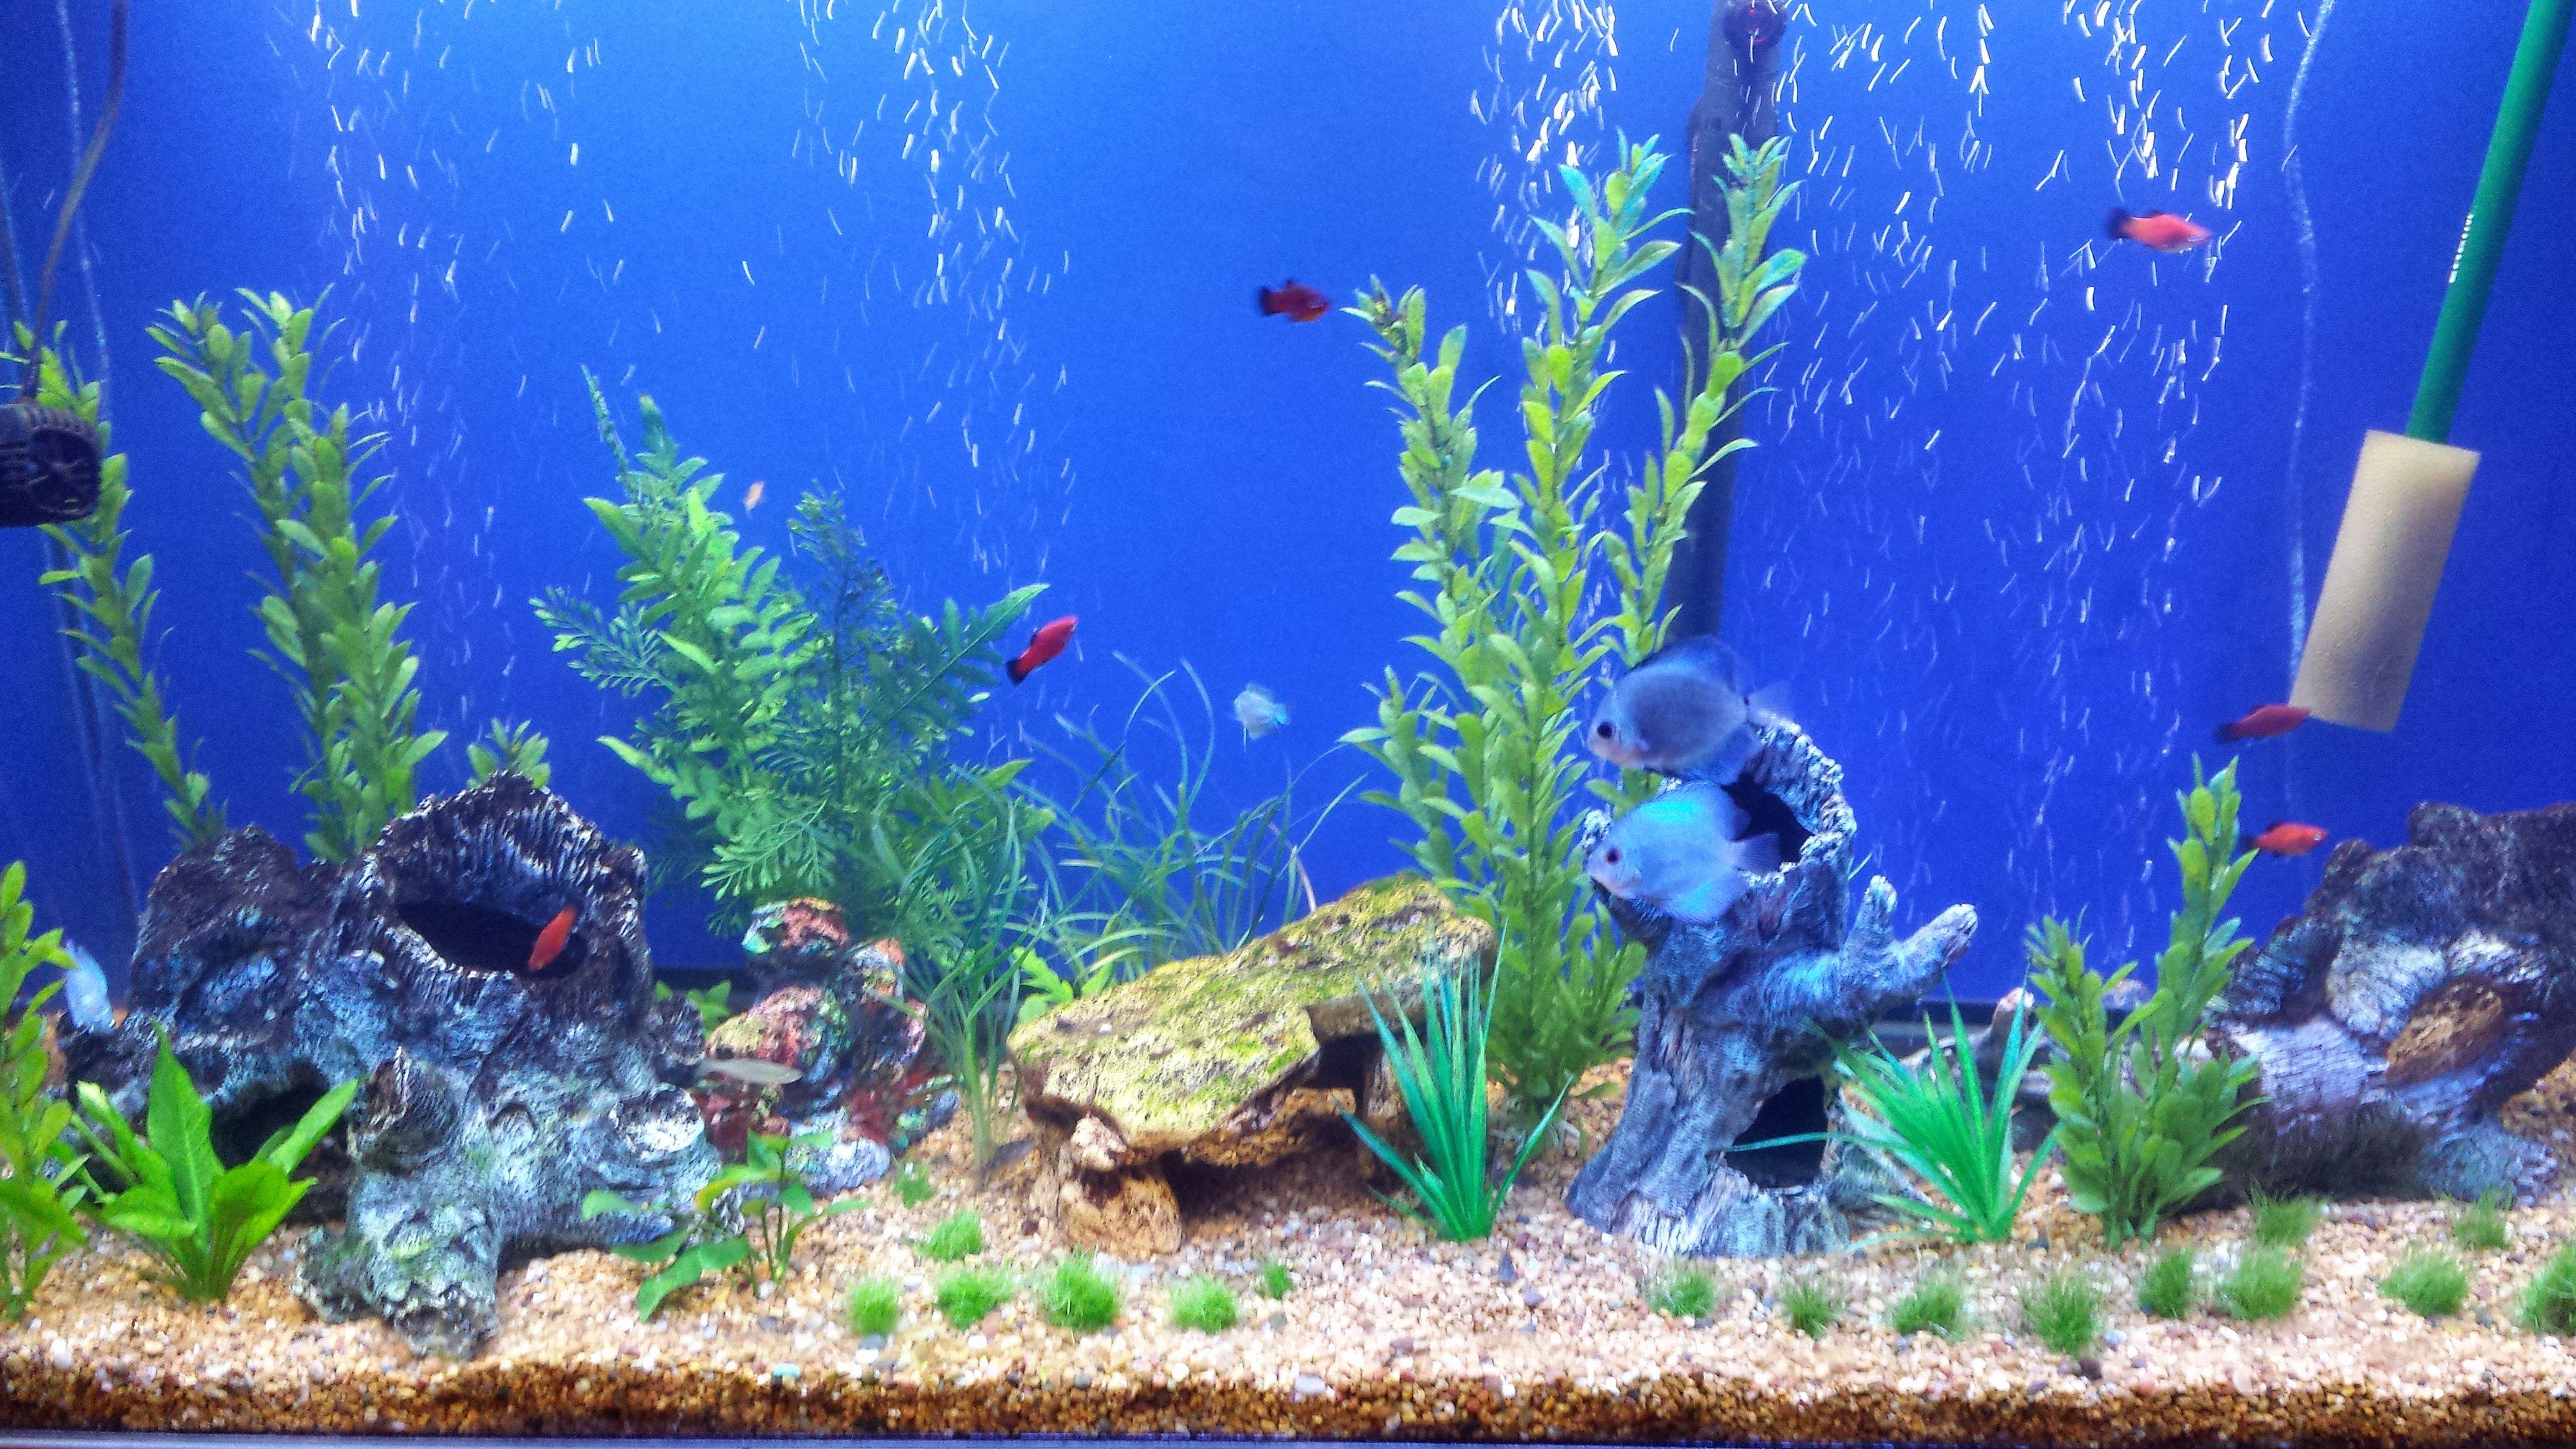 Cool Fish Tank Backgrounds Unique Fish Tank Wallpaper Wallpapersafari